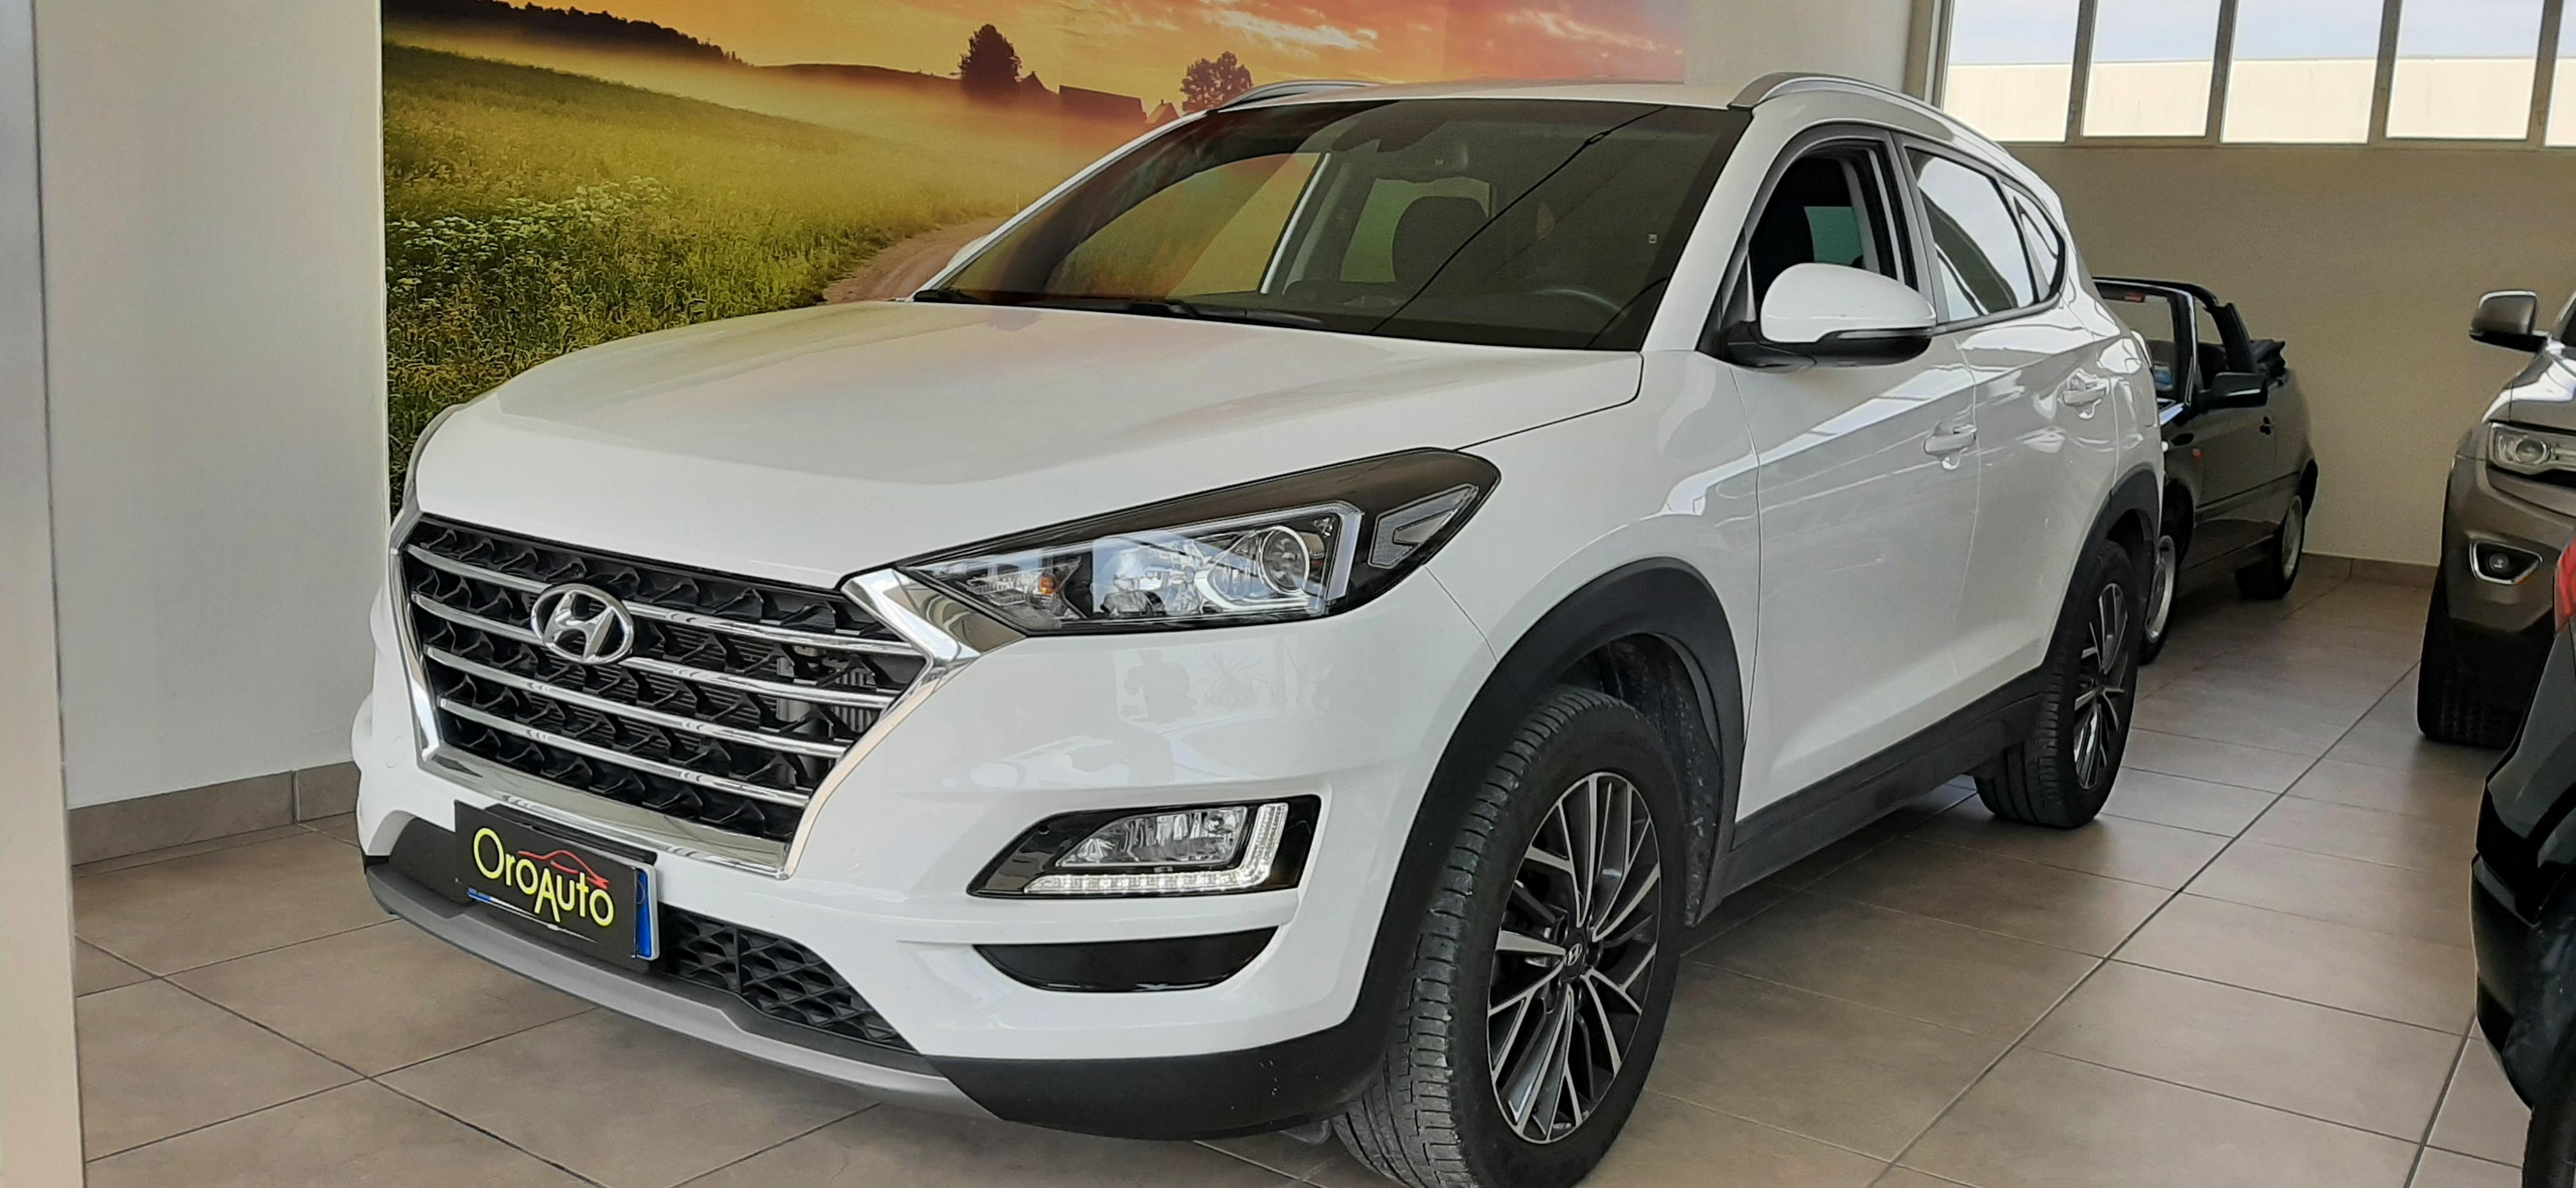 Hyundai Tucson Tucson 1.6 crdi  2wd 115cv my20-NAVI-CAMERA-PDC-FULL